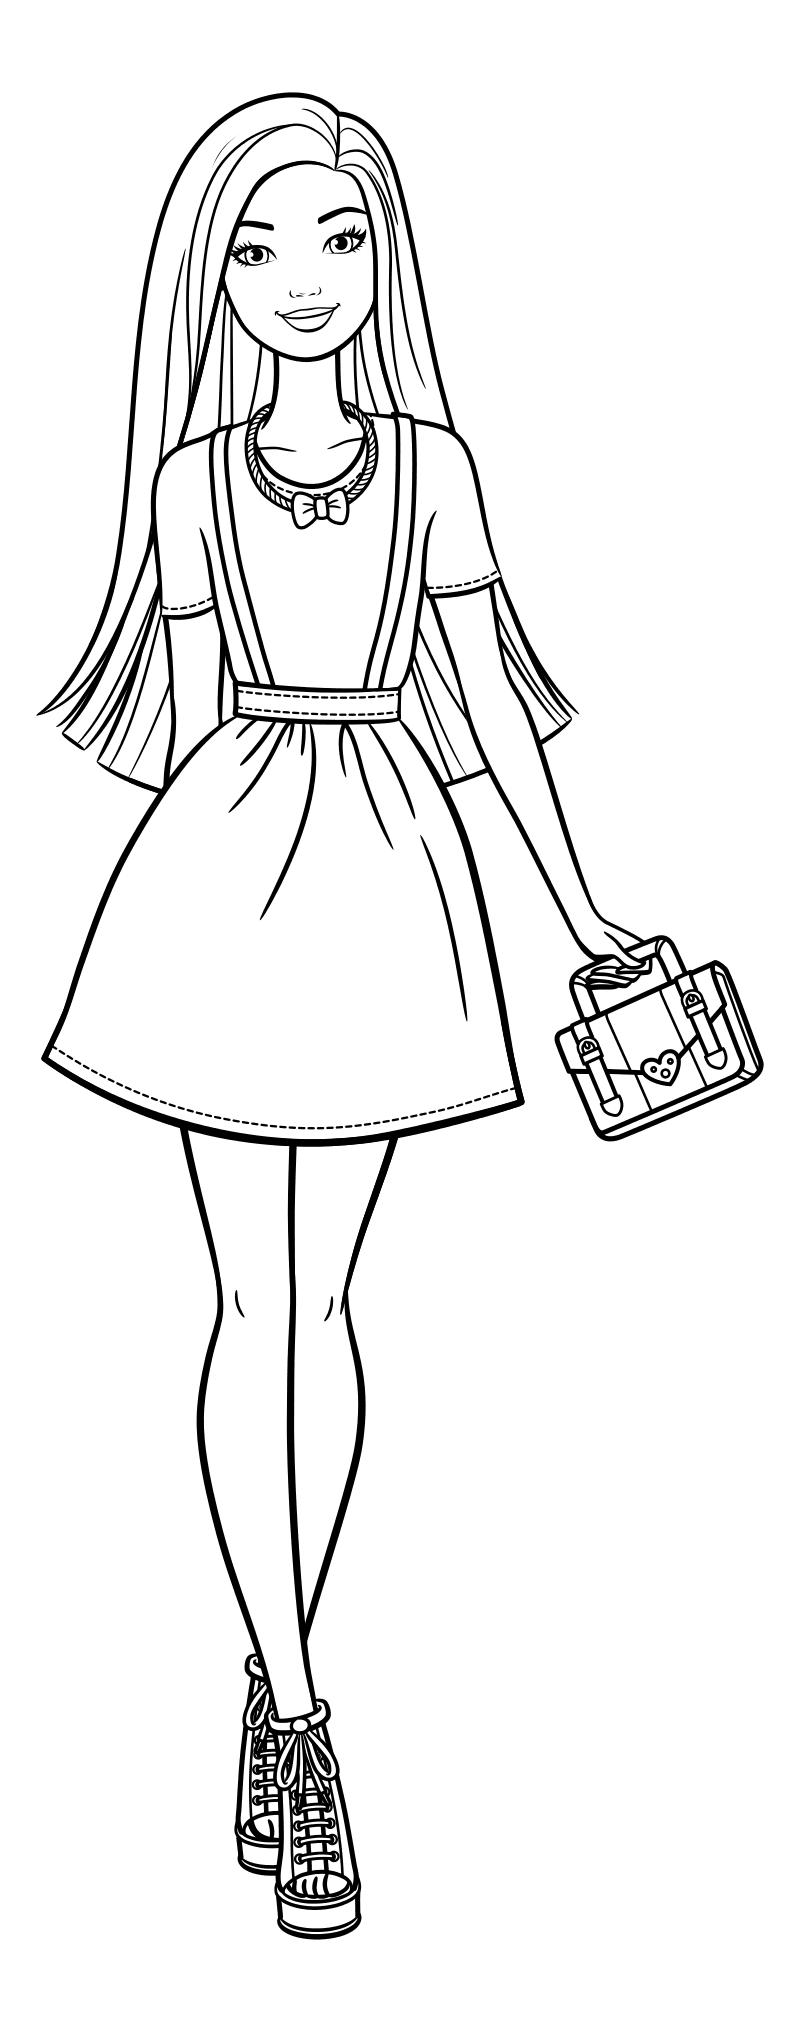 Раскраска - Барби - Барби - элегантная модница | MirChild